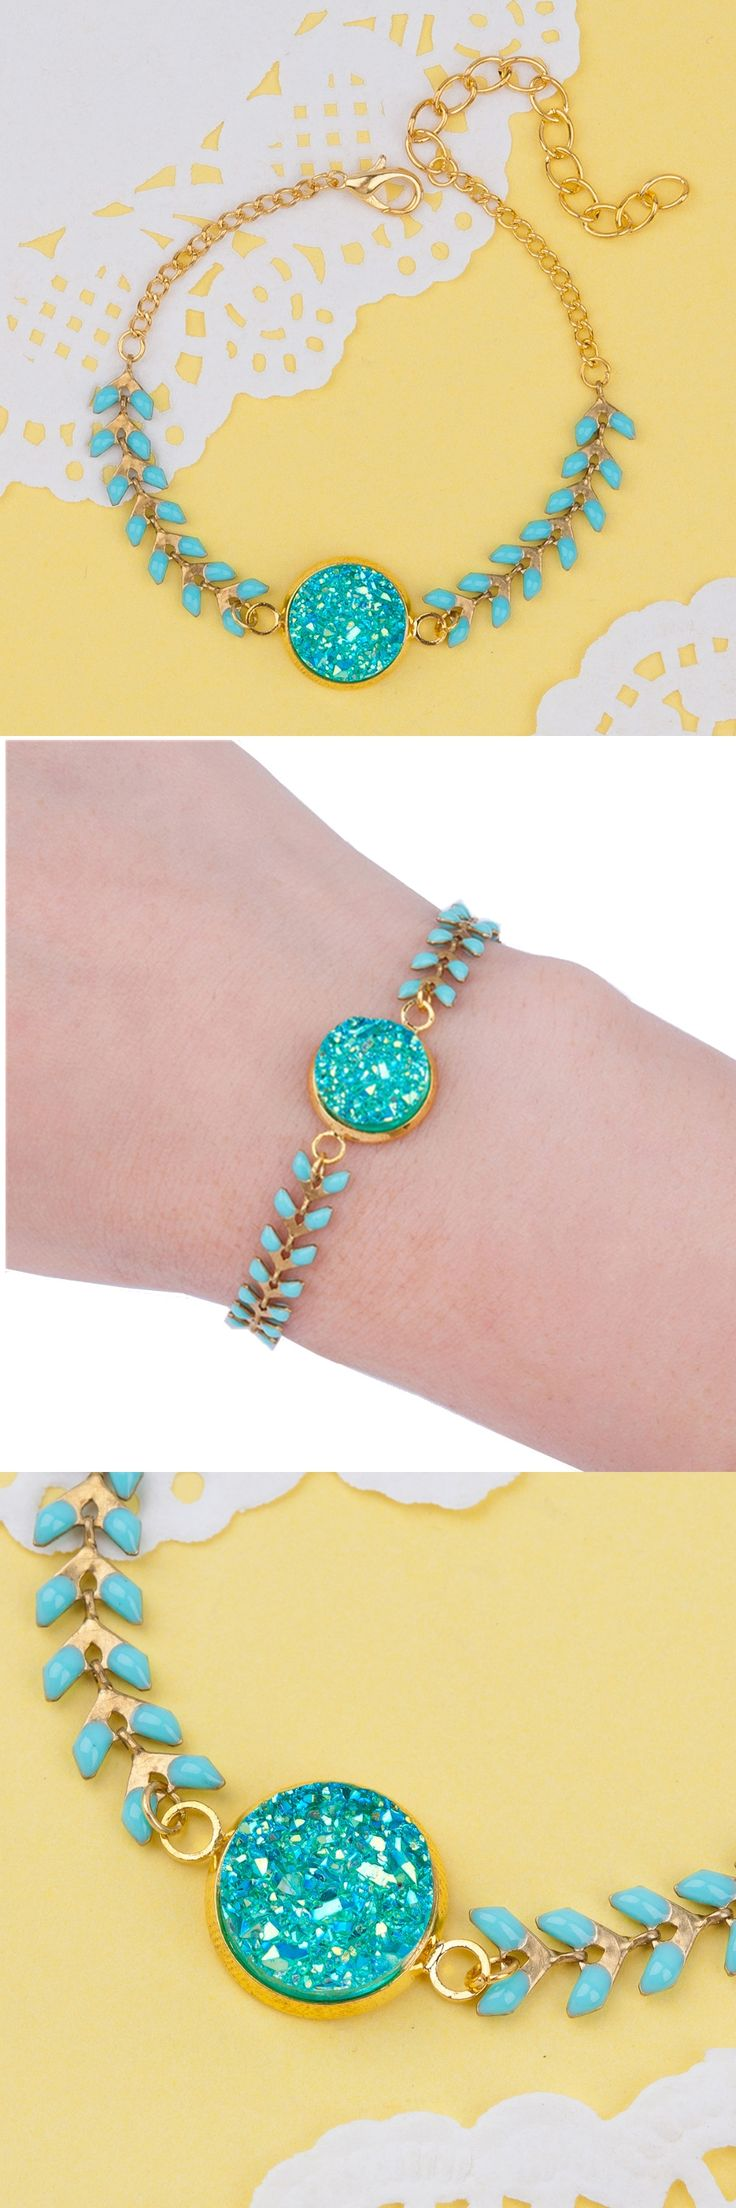 DoreenBeads Gold color Druzy Charm Bracelet Mint Green Enamel Herringbone Chain Round Resin Green AB Color Connector 15.5cm 1PC